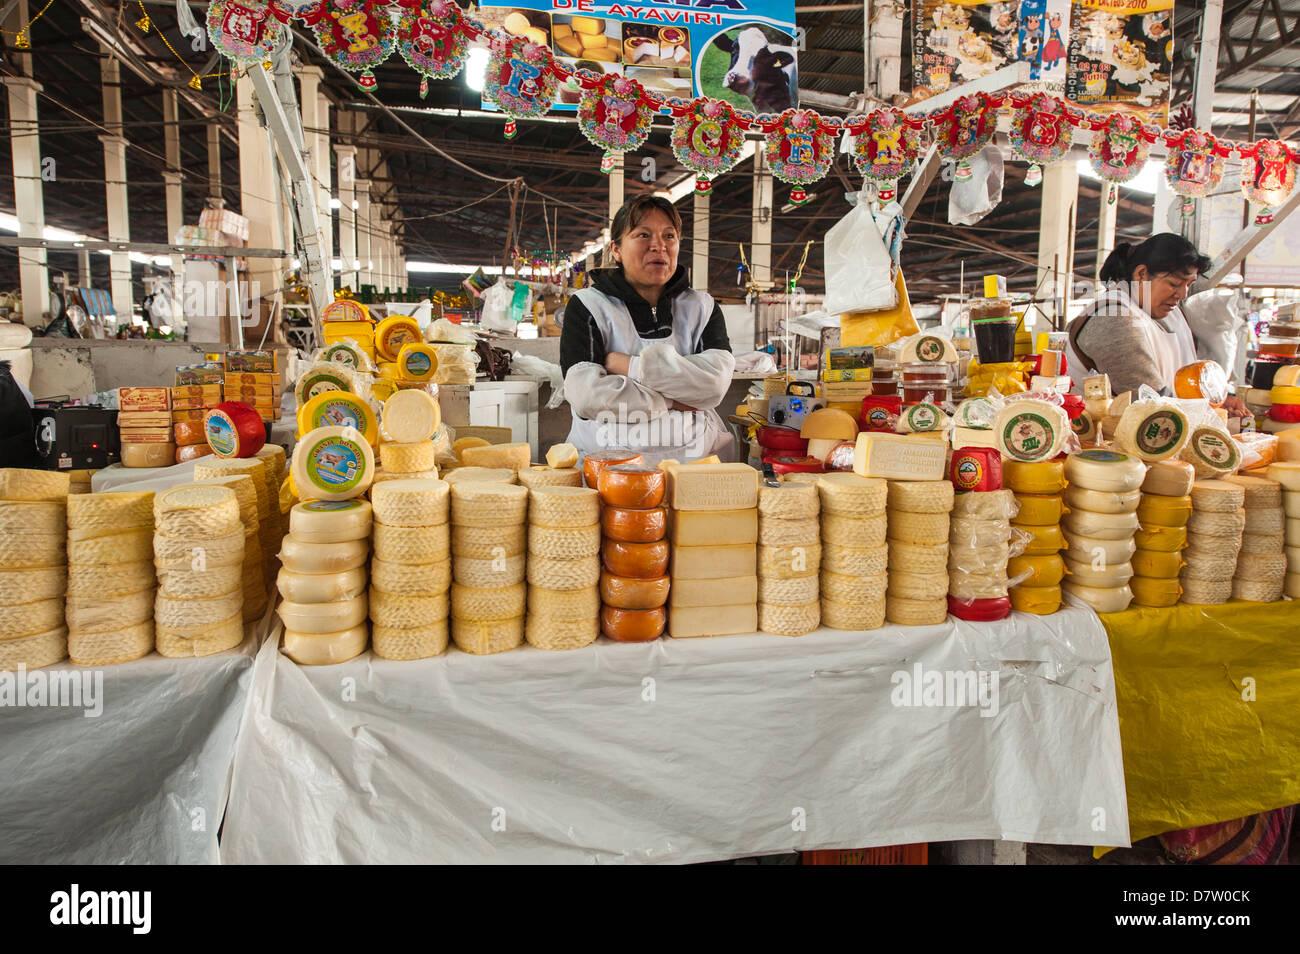 Cheese vendor in local market, Cuzco, Peru, South America - Stock Image